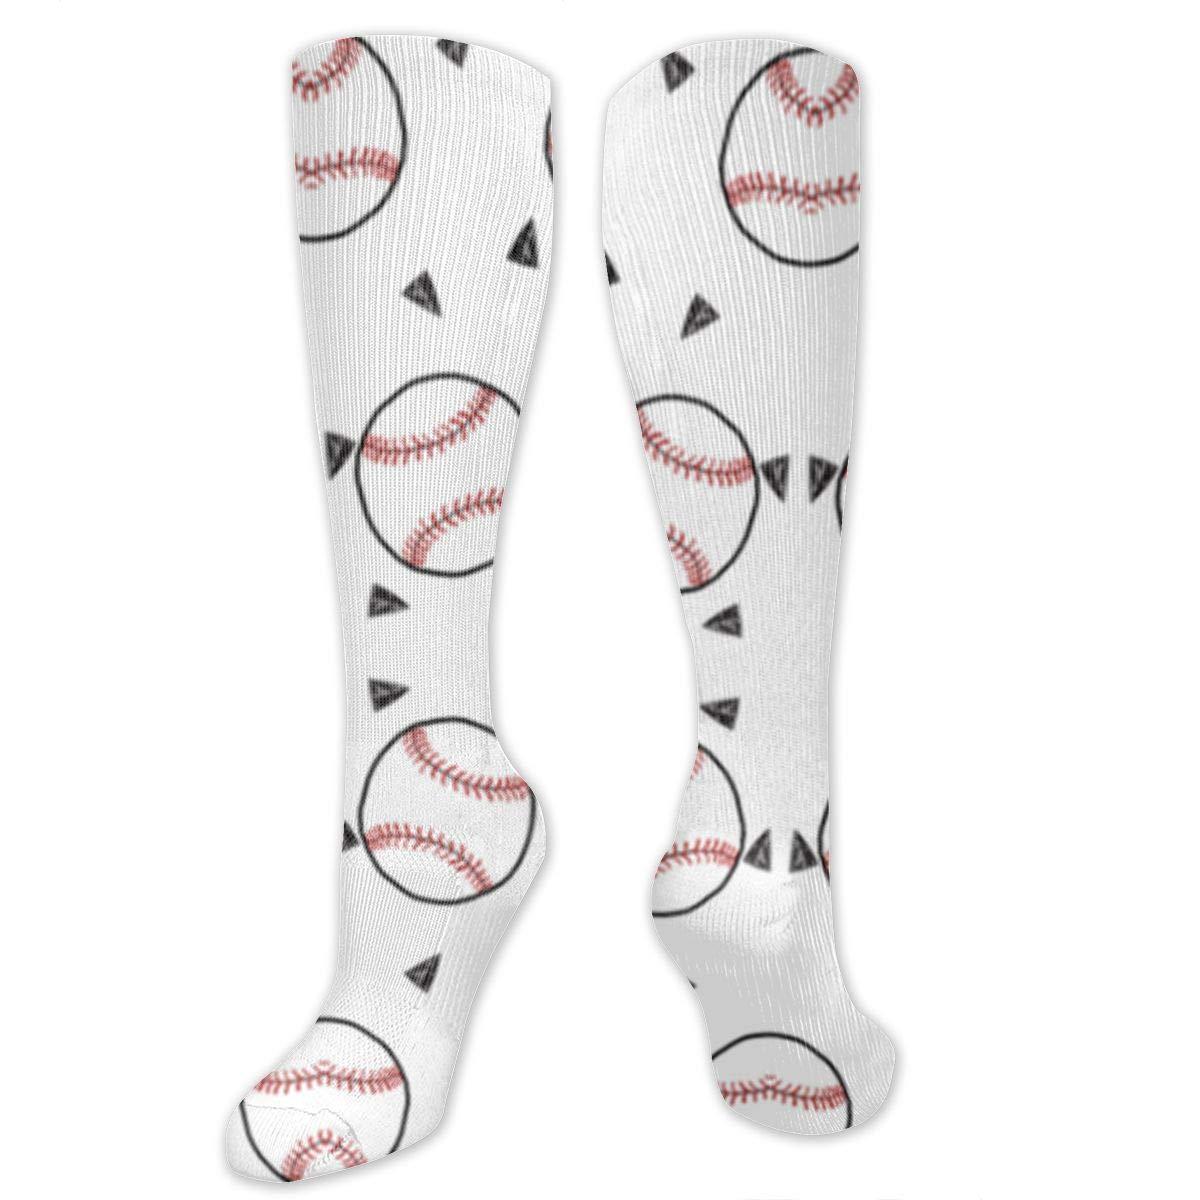 Men Multicolored Pattern Fashionable Fun Crew Cotton Socks Chanwazibibiliu Baseball Sports Baseball American Themed Mens Colorful Dress Socks Funky